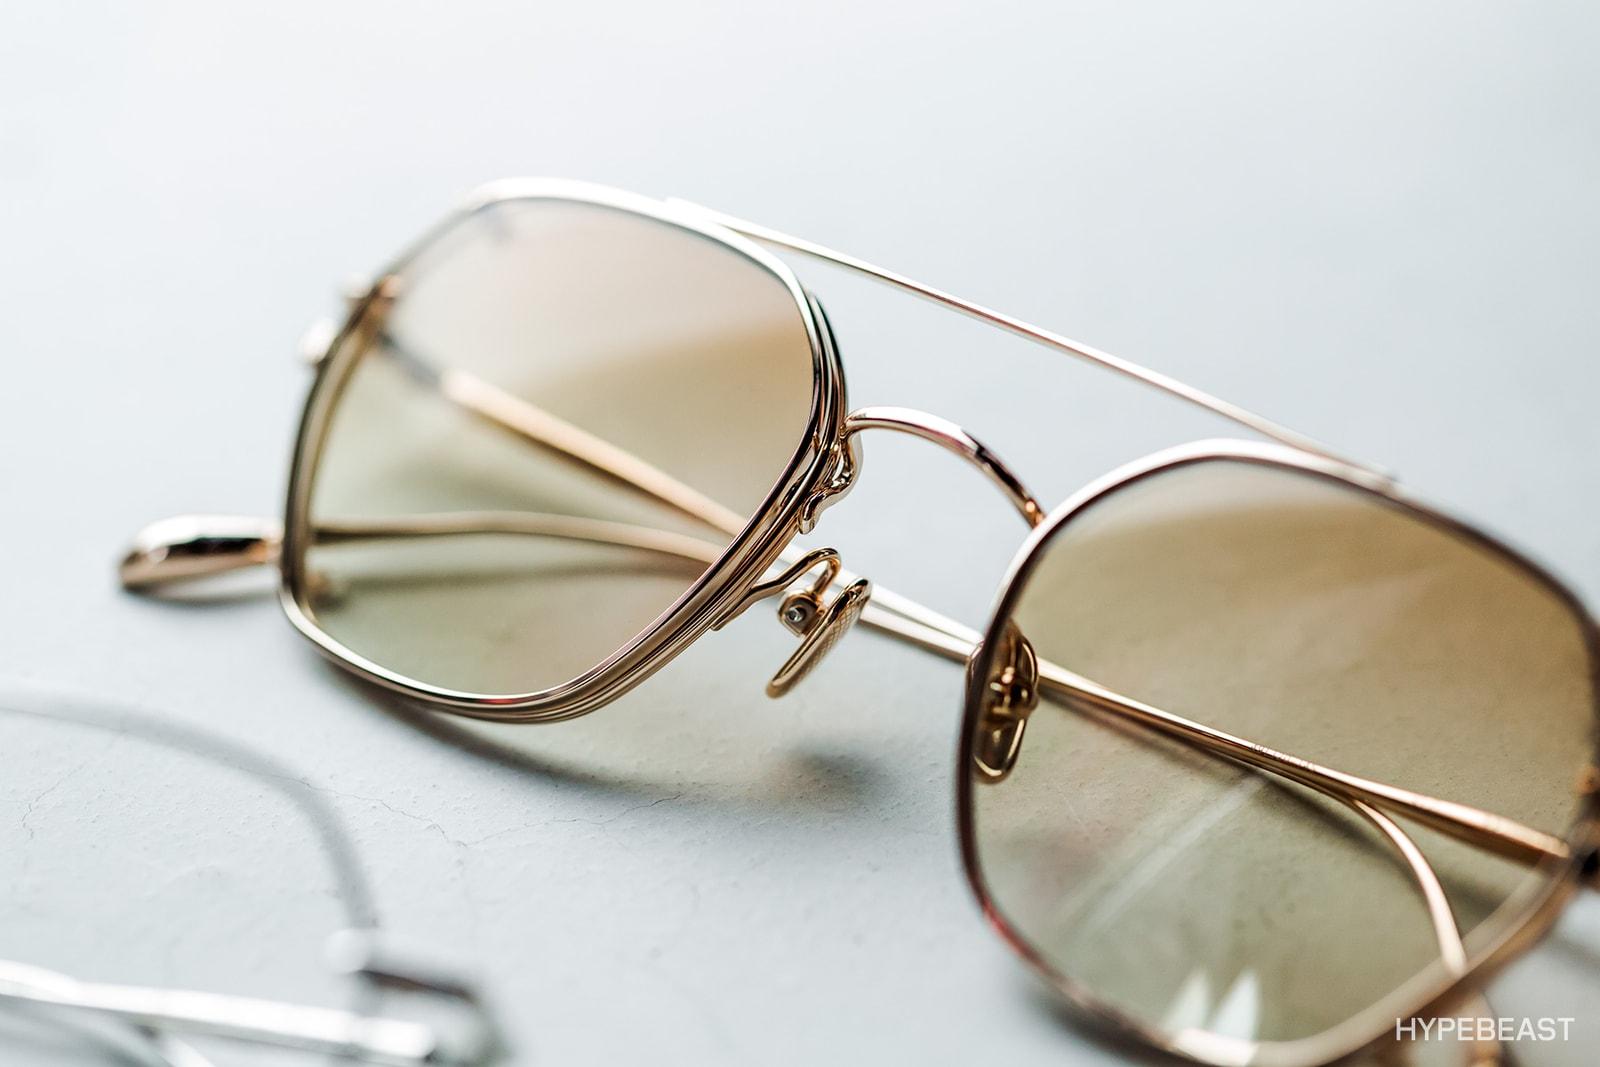 HYPEBEAST 專訪眼鏡品牌 Frency & Mercury 主理人 Eque.M